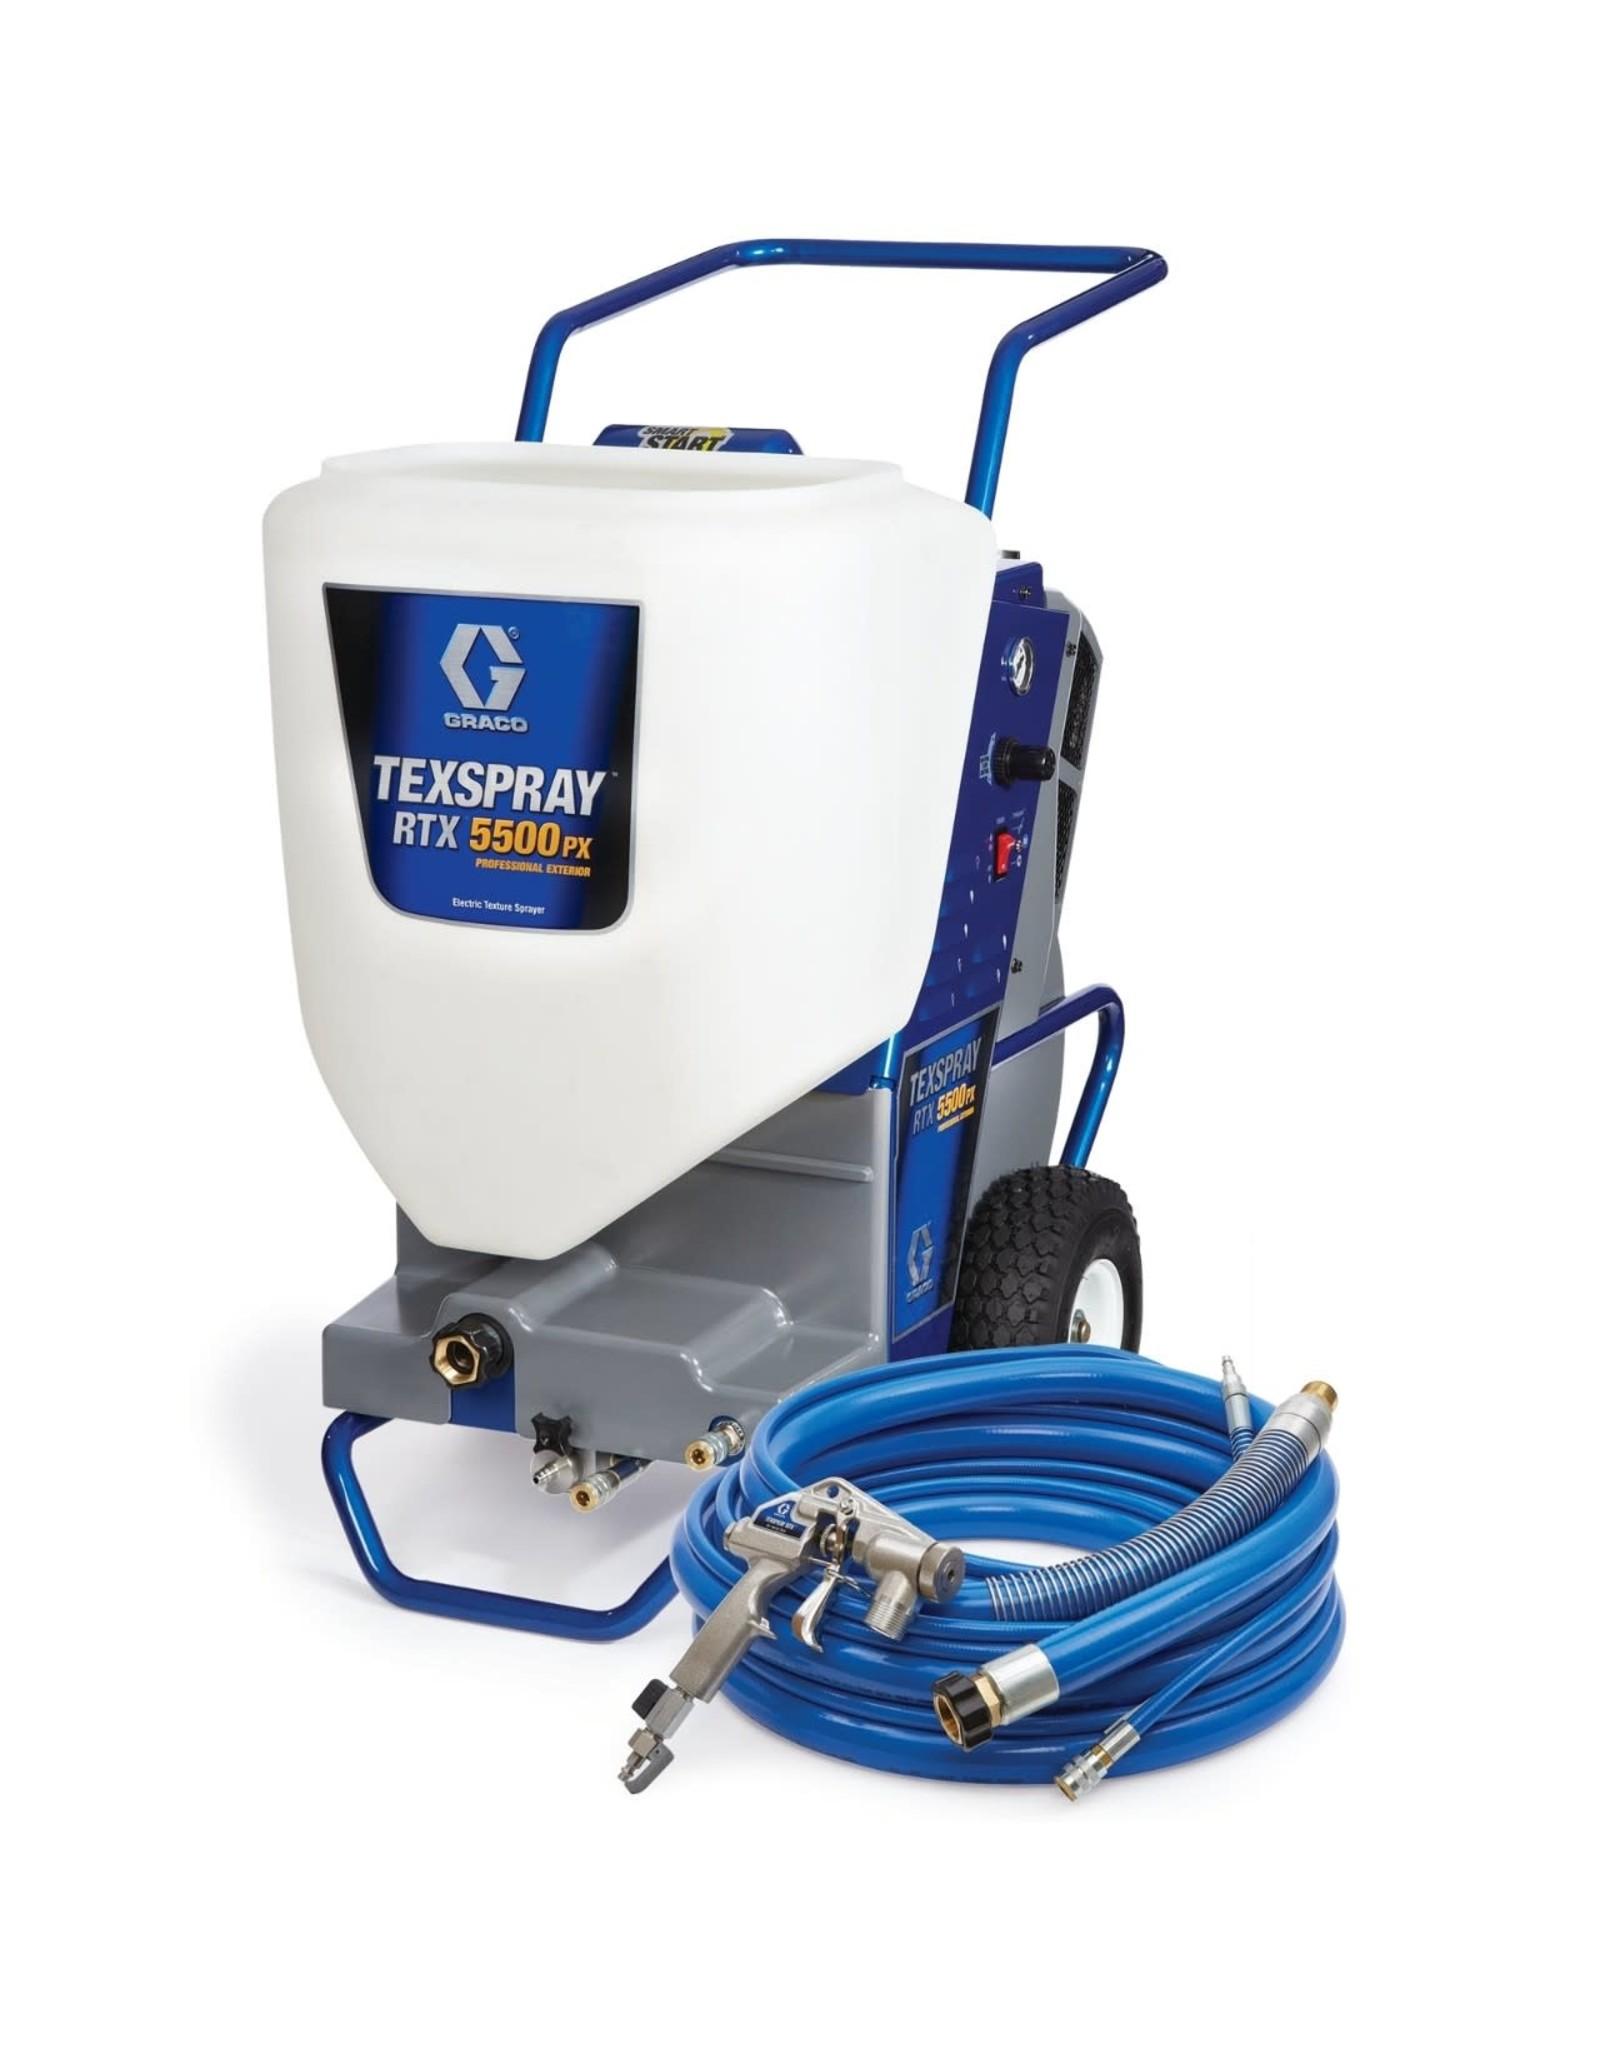 Graco 17H571TexSpray RTX 5500PX Texture Sprayer